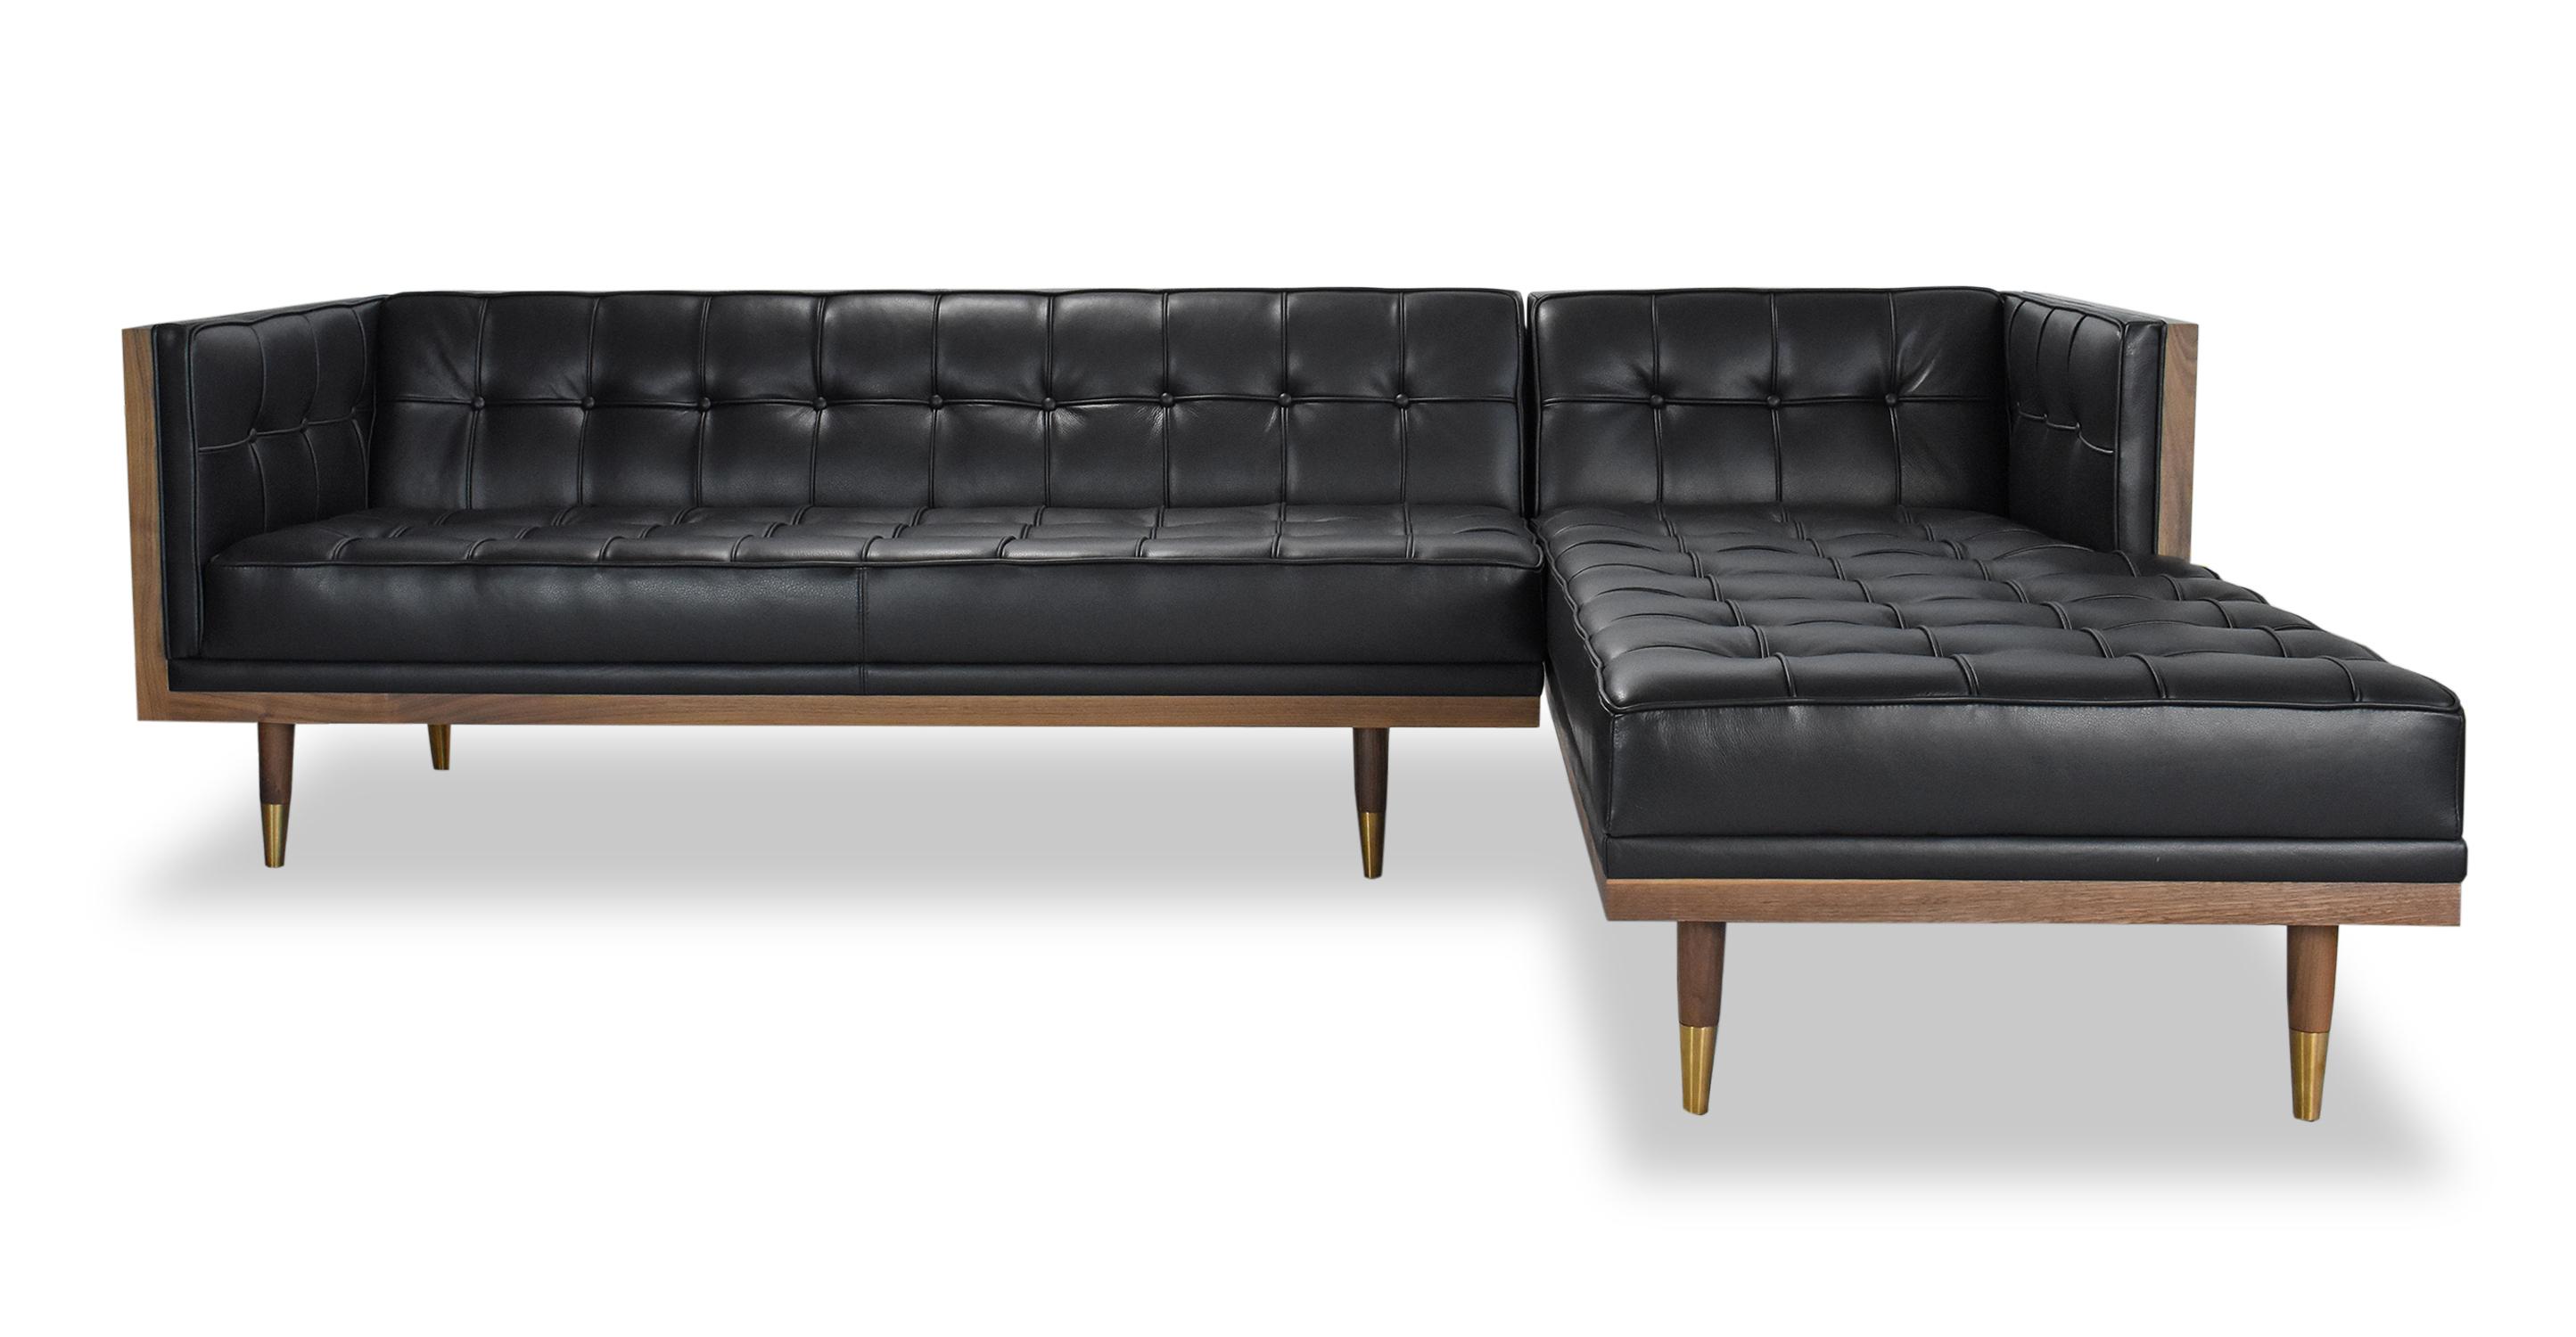 "Woodrow Box 100"" Leather Sofa Sectional Right, Walnut/Black Aniline"